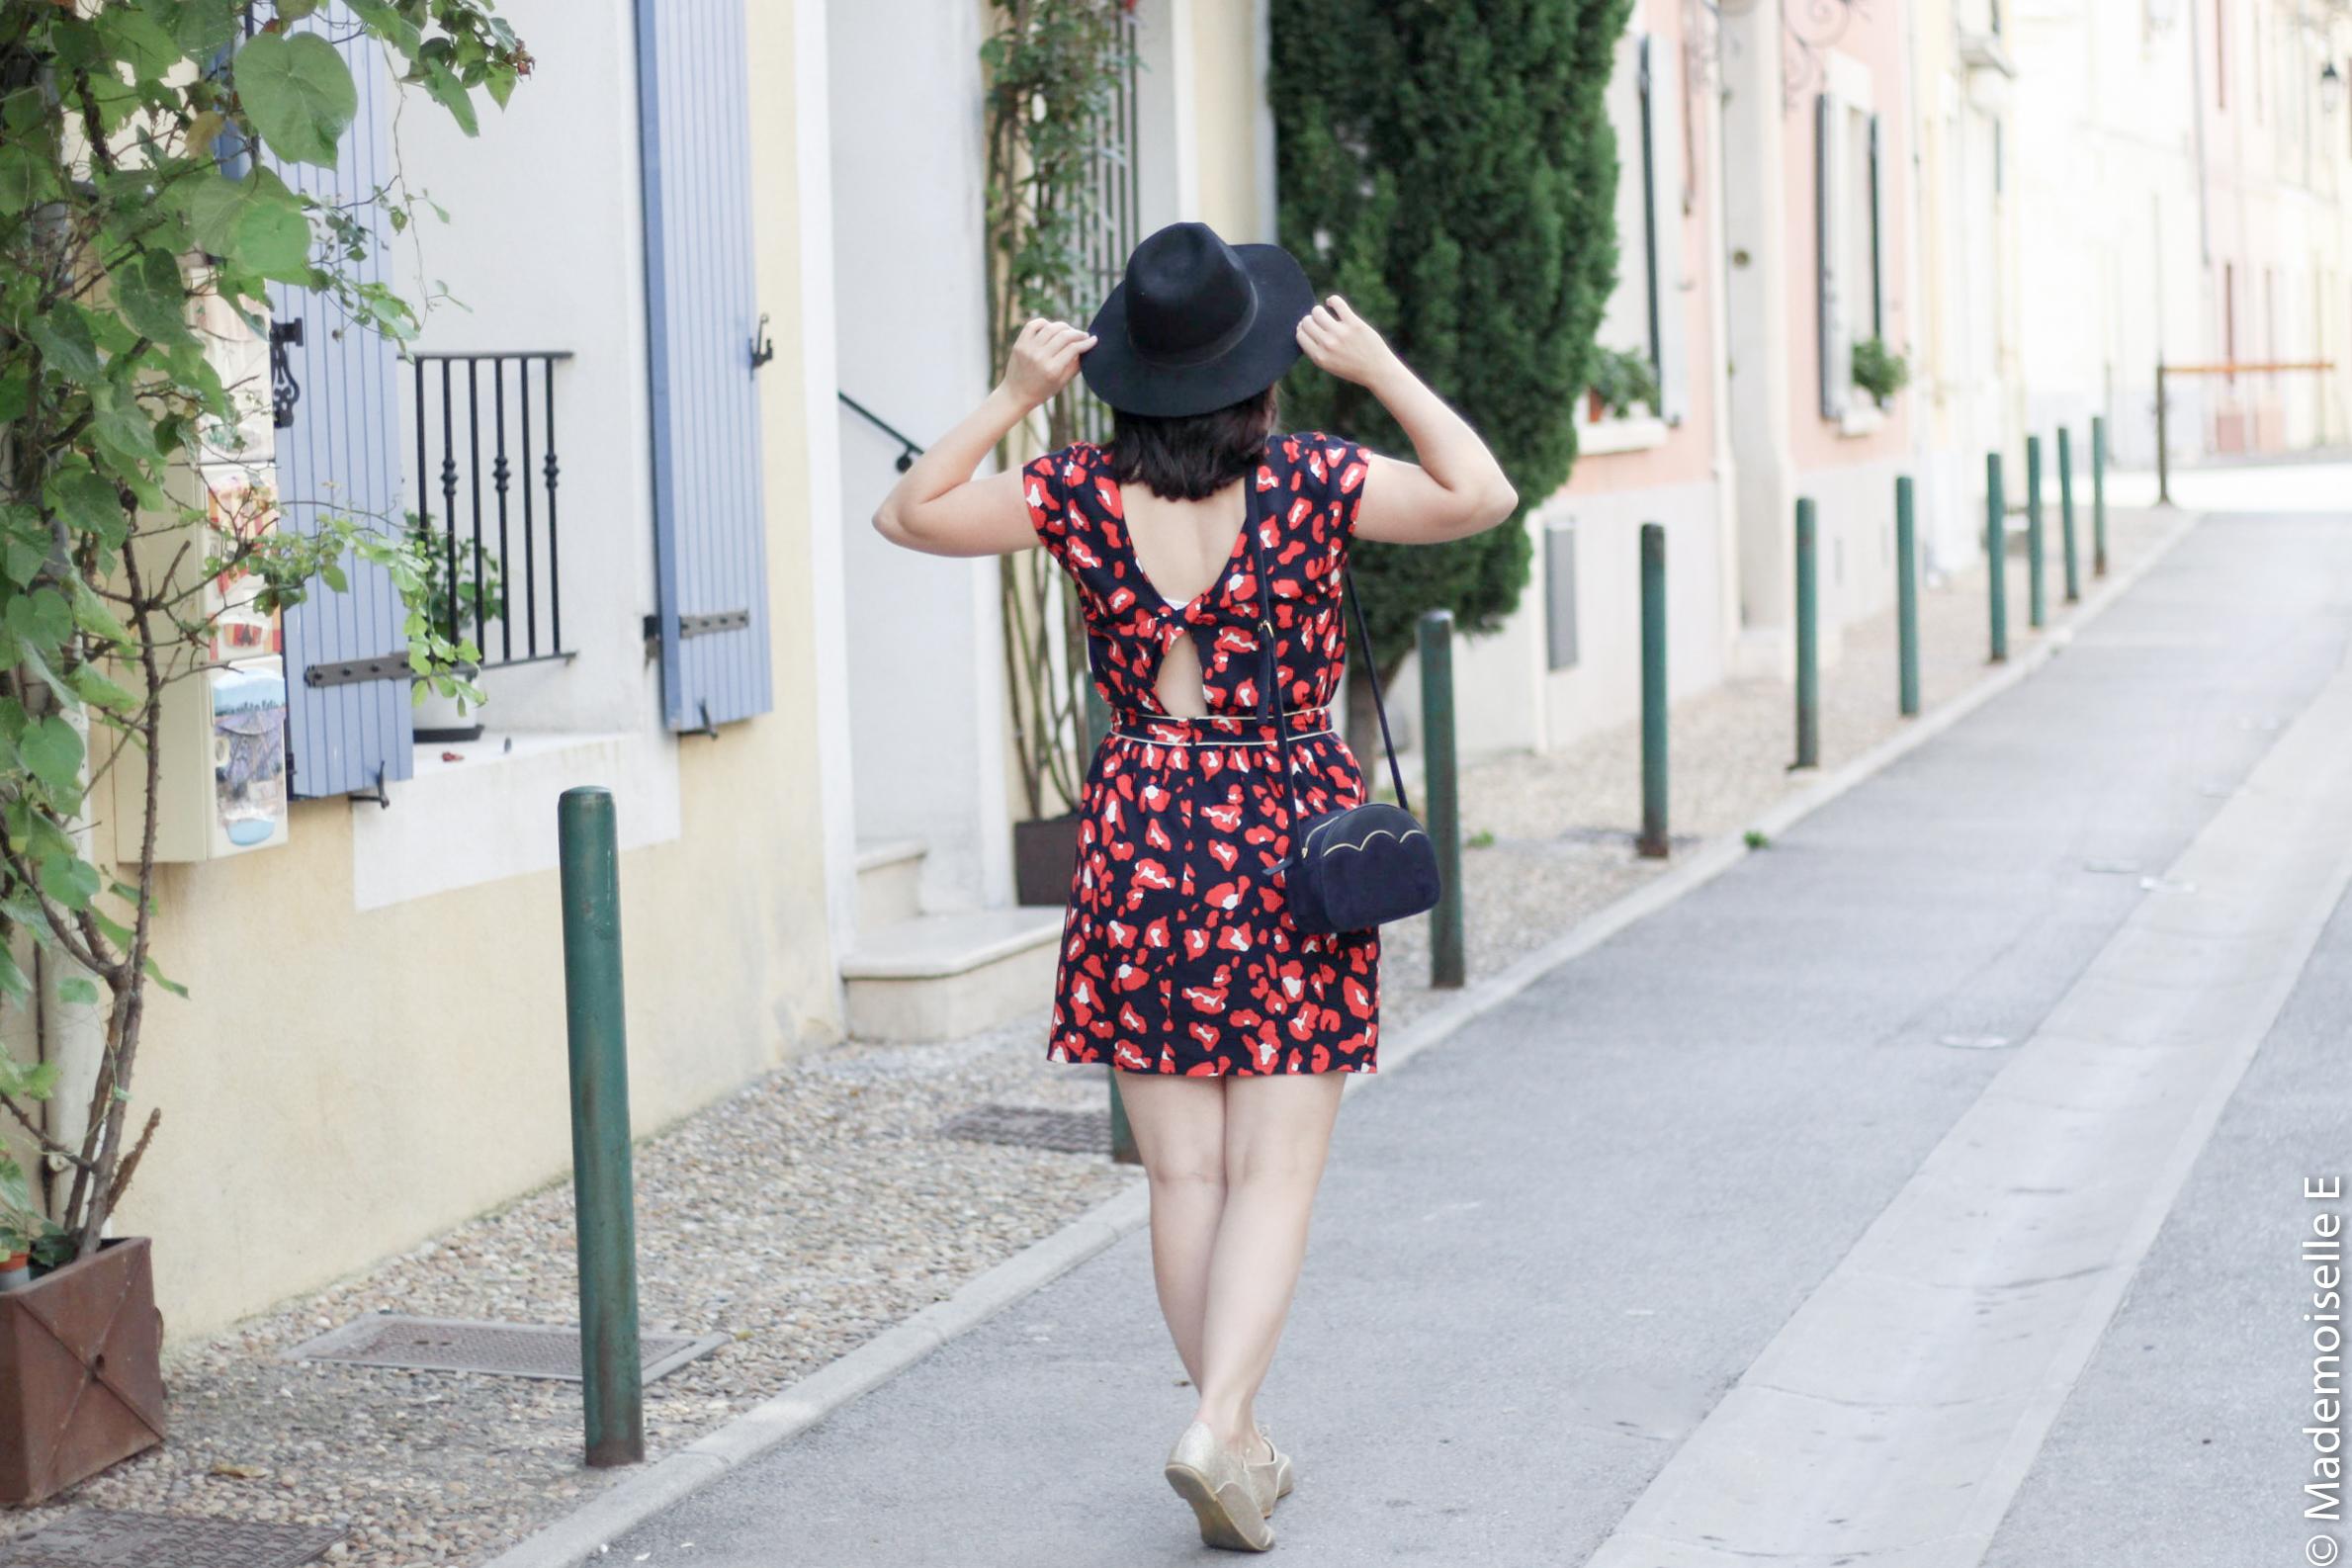 robe leopard tendance 2018 5 mademoiselle-e